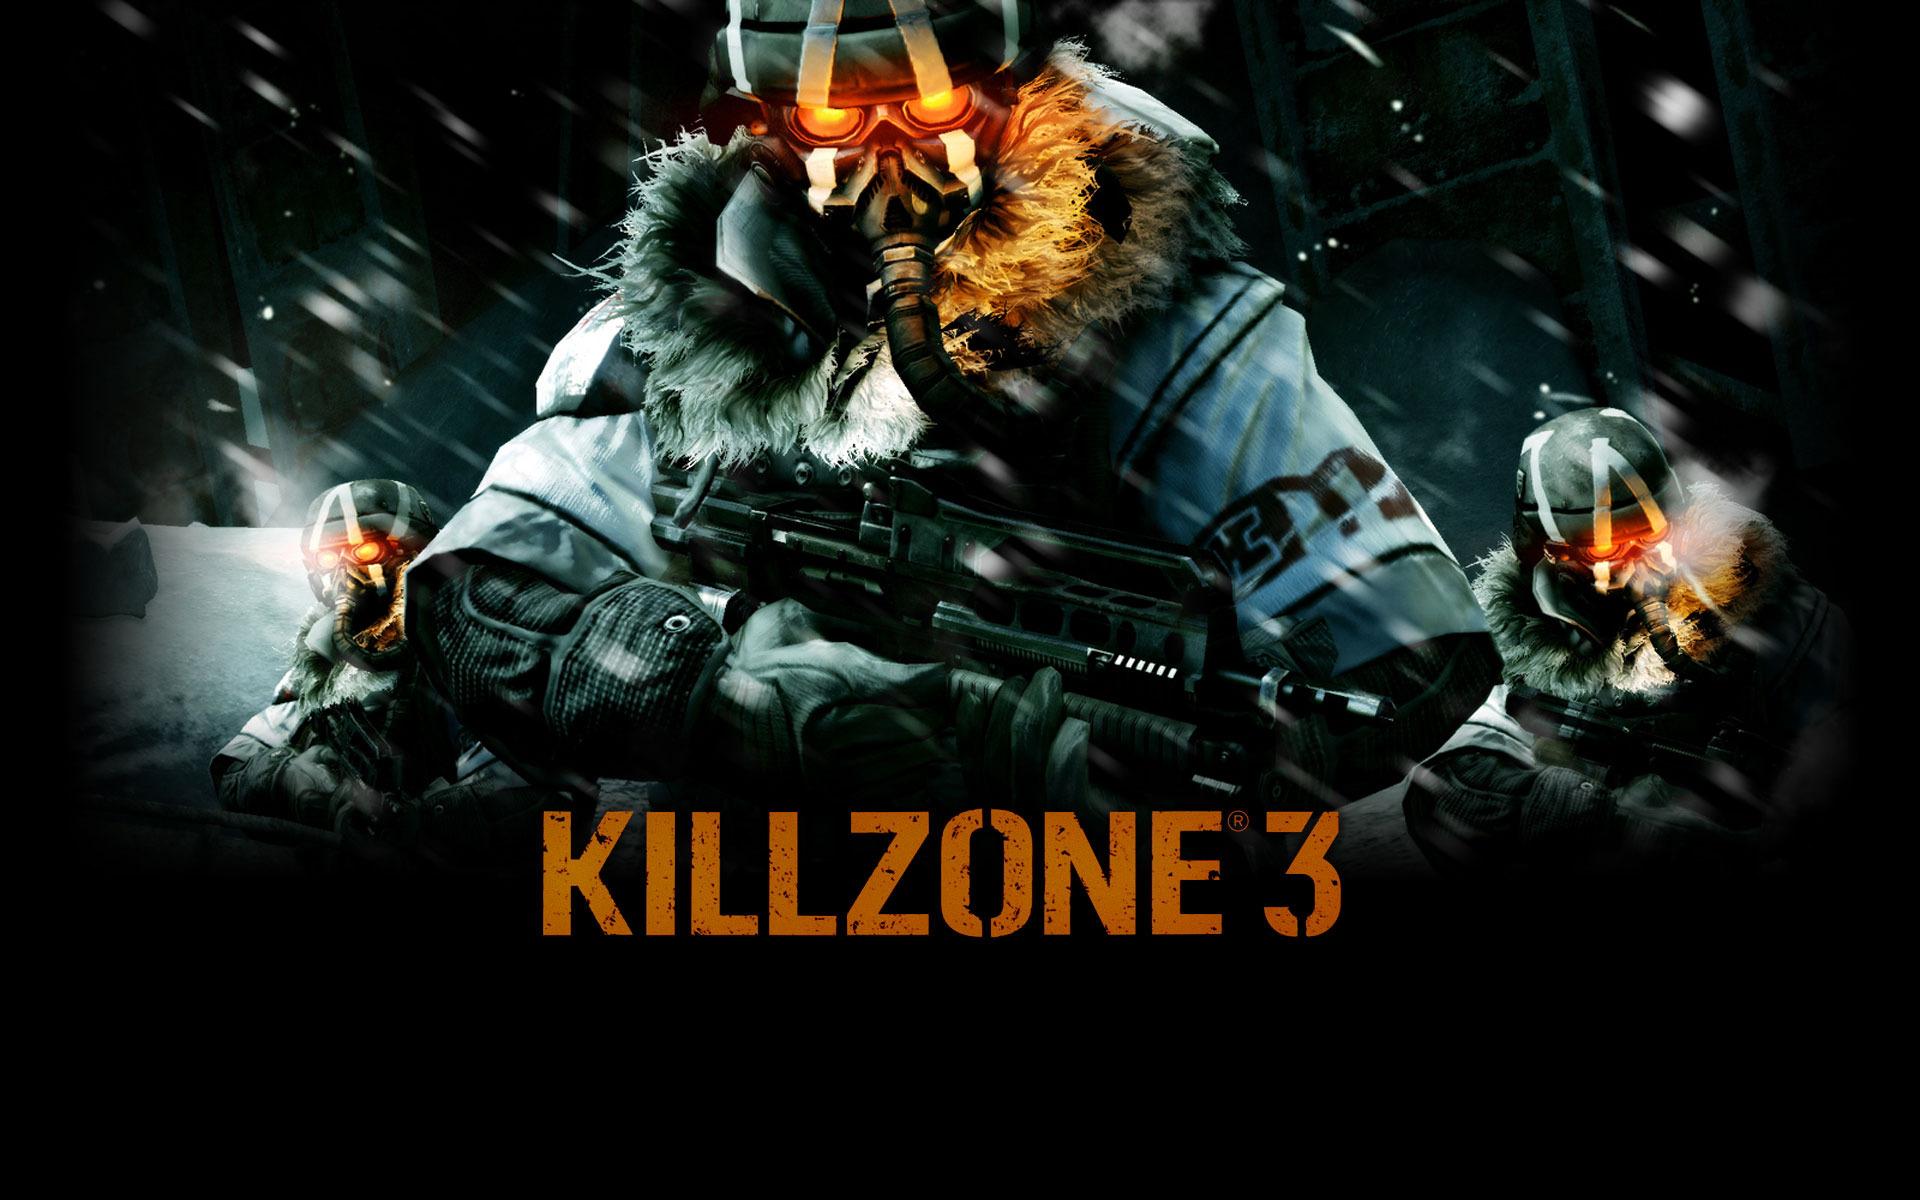 Killzone 3 background wallpaper 304620 for Fond ecran ps3